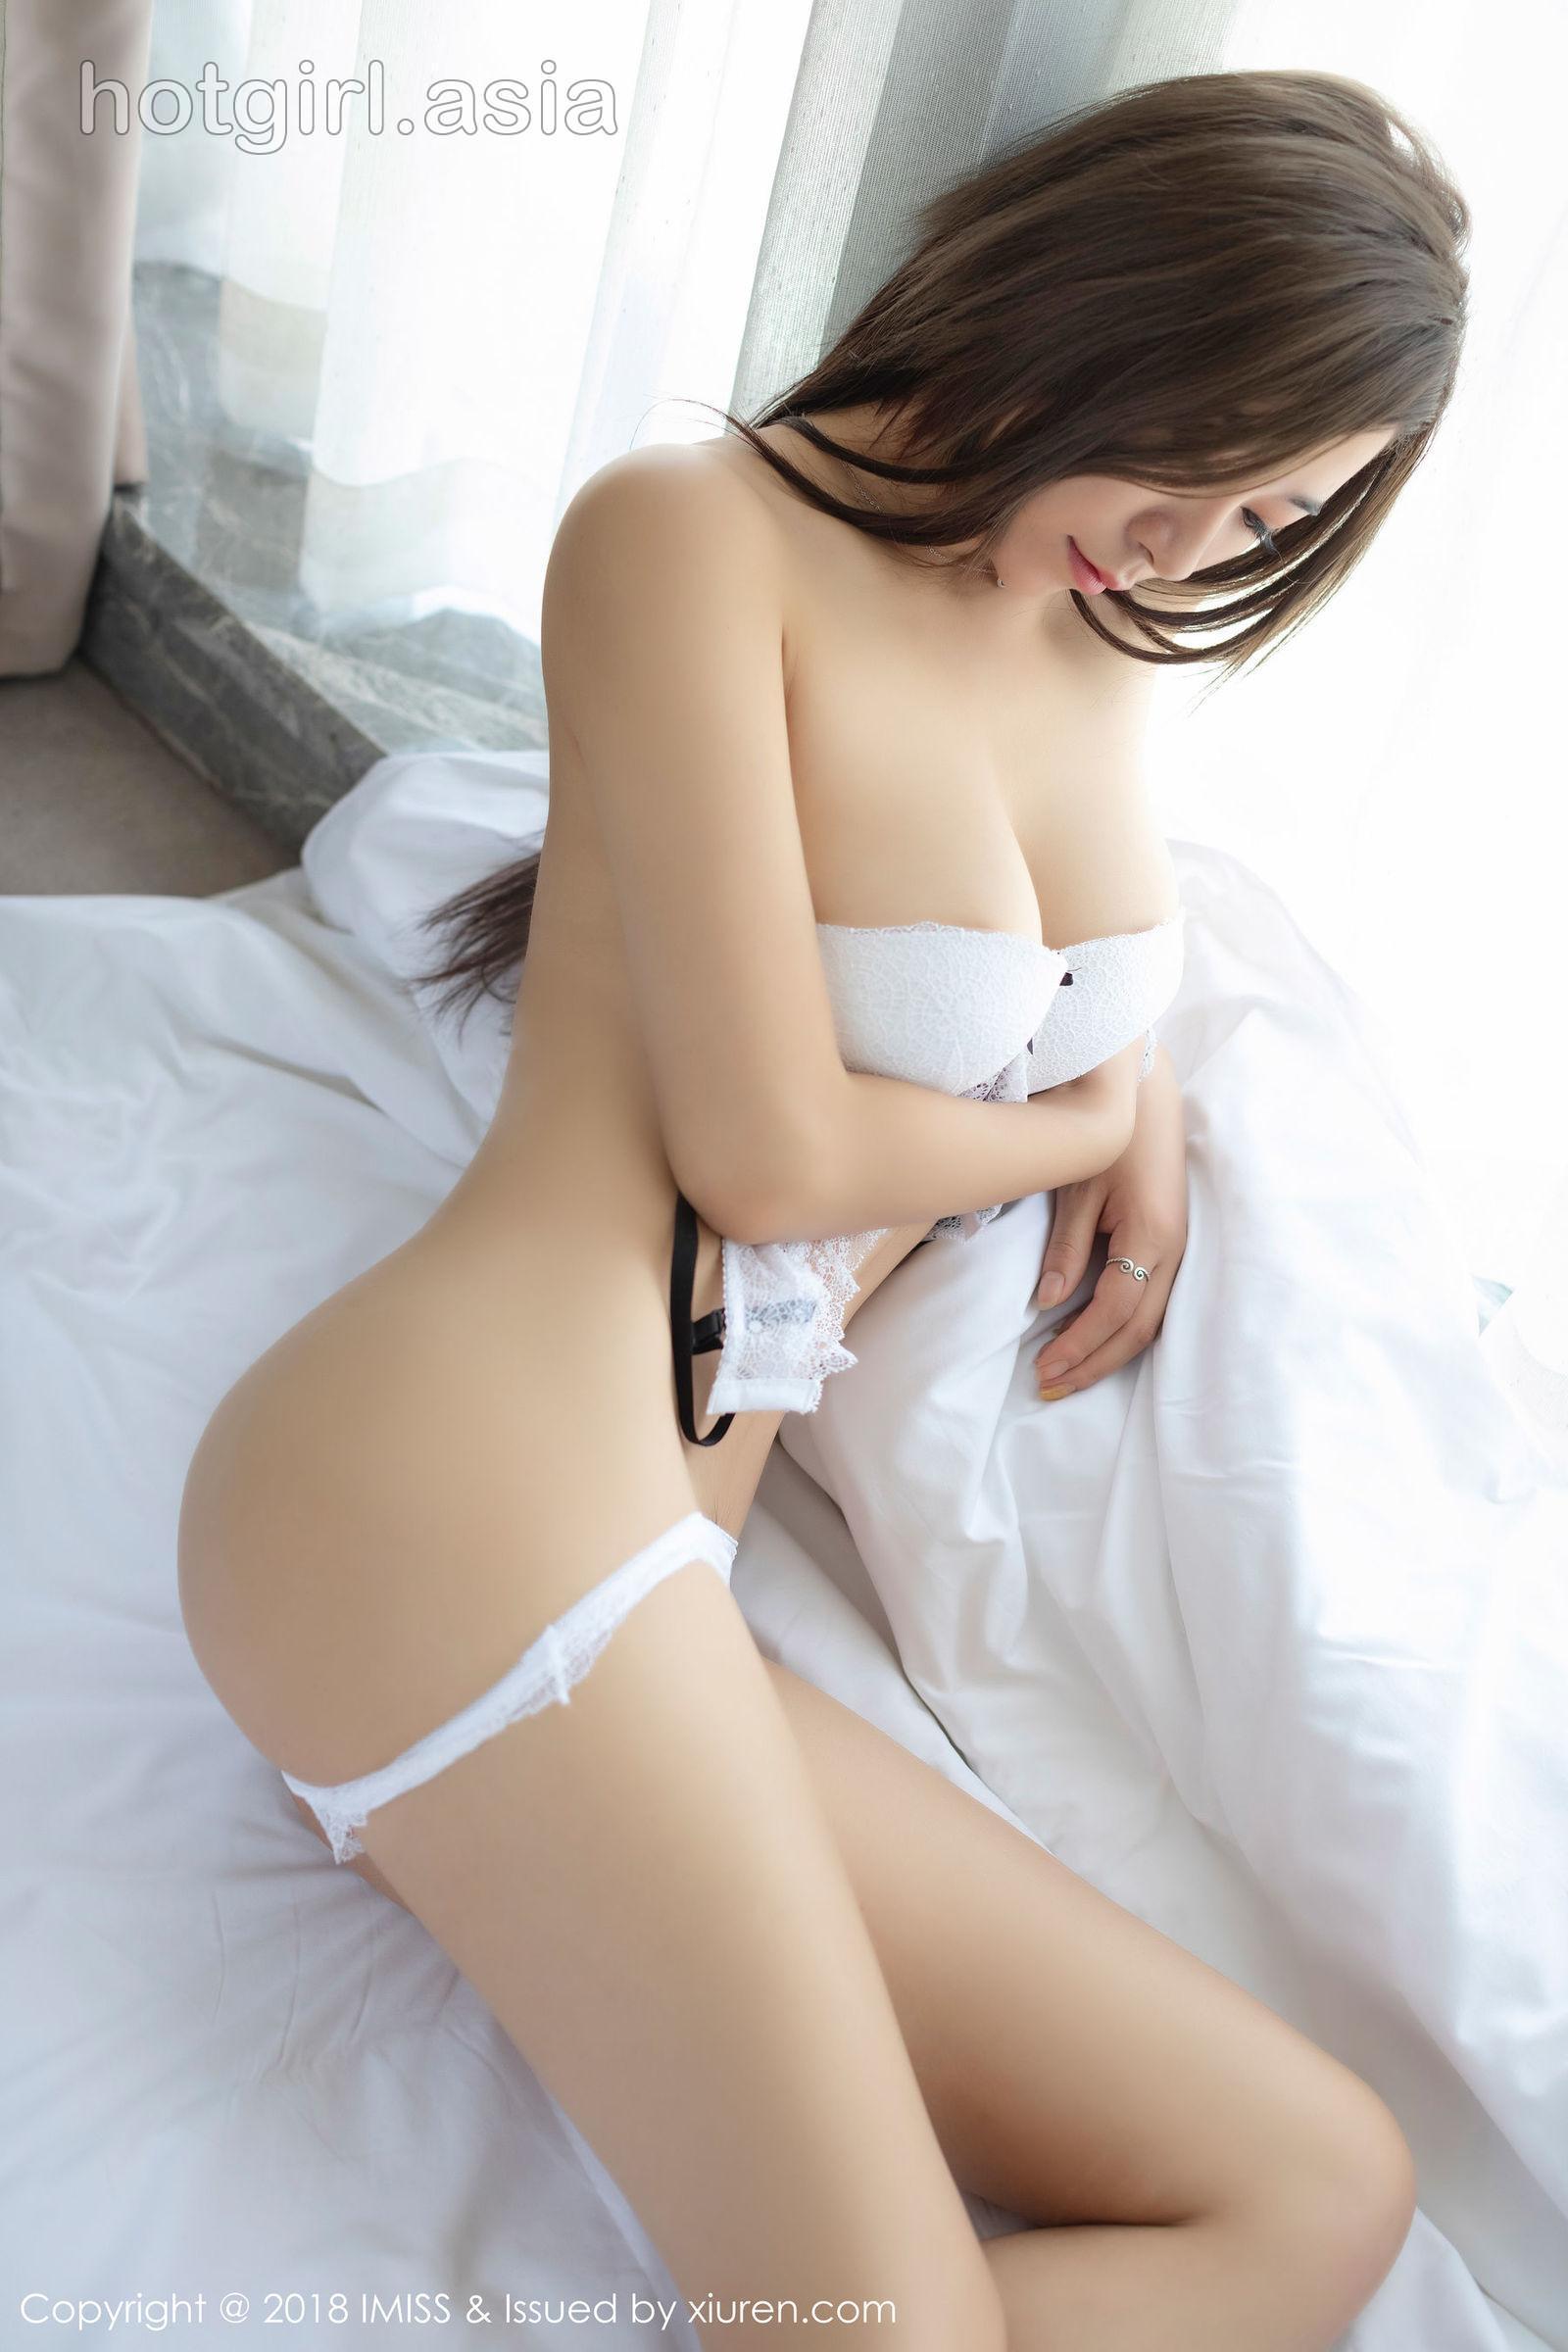 [IMiss 爱 蜜 社] Vol.302 Model @ 雪儿 Cier Sexy Photo